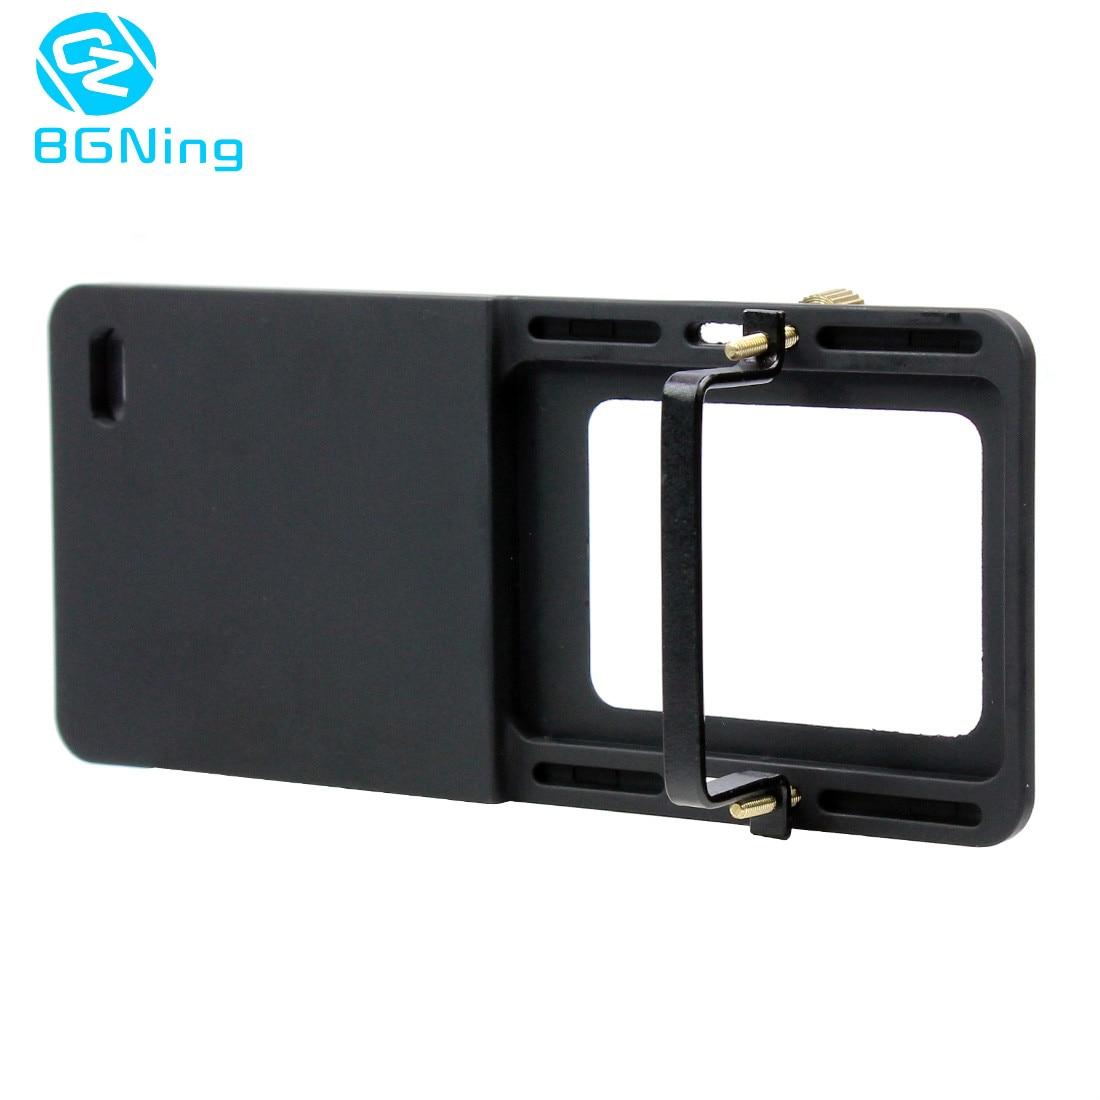 BGNING Handheld Gimbal Adapter Switch Mount Plate for GoPro Hero 3 3+ 4 Yi 4k Camera for DJI Osmo Zhiyun Smooth Q Mobile